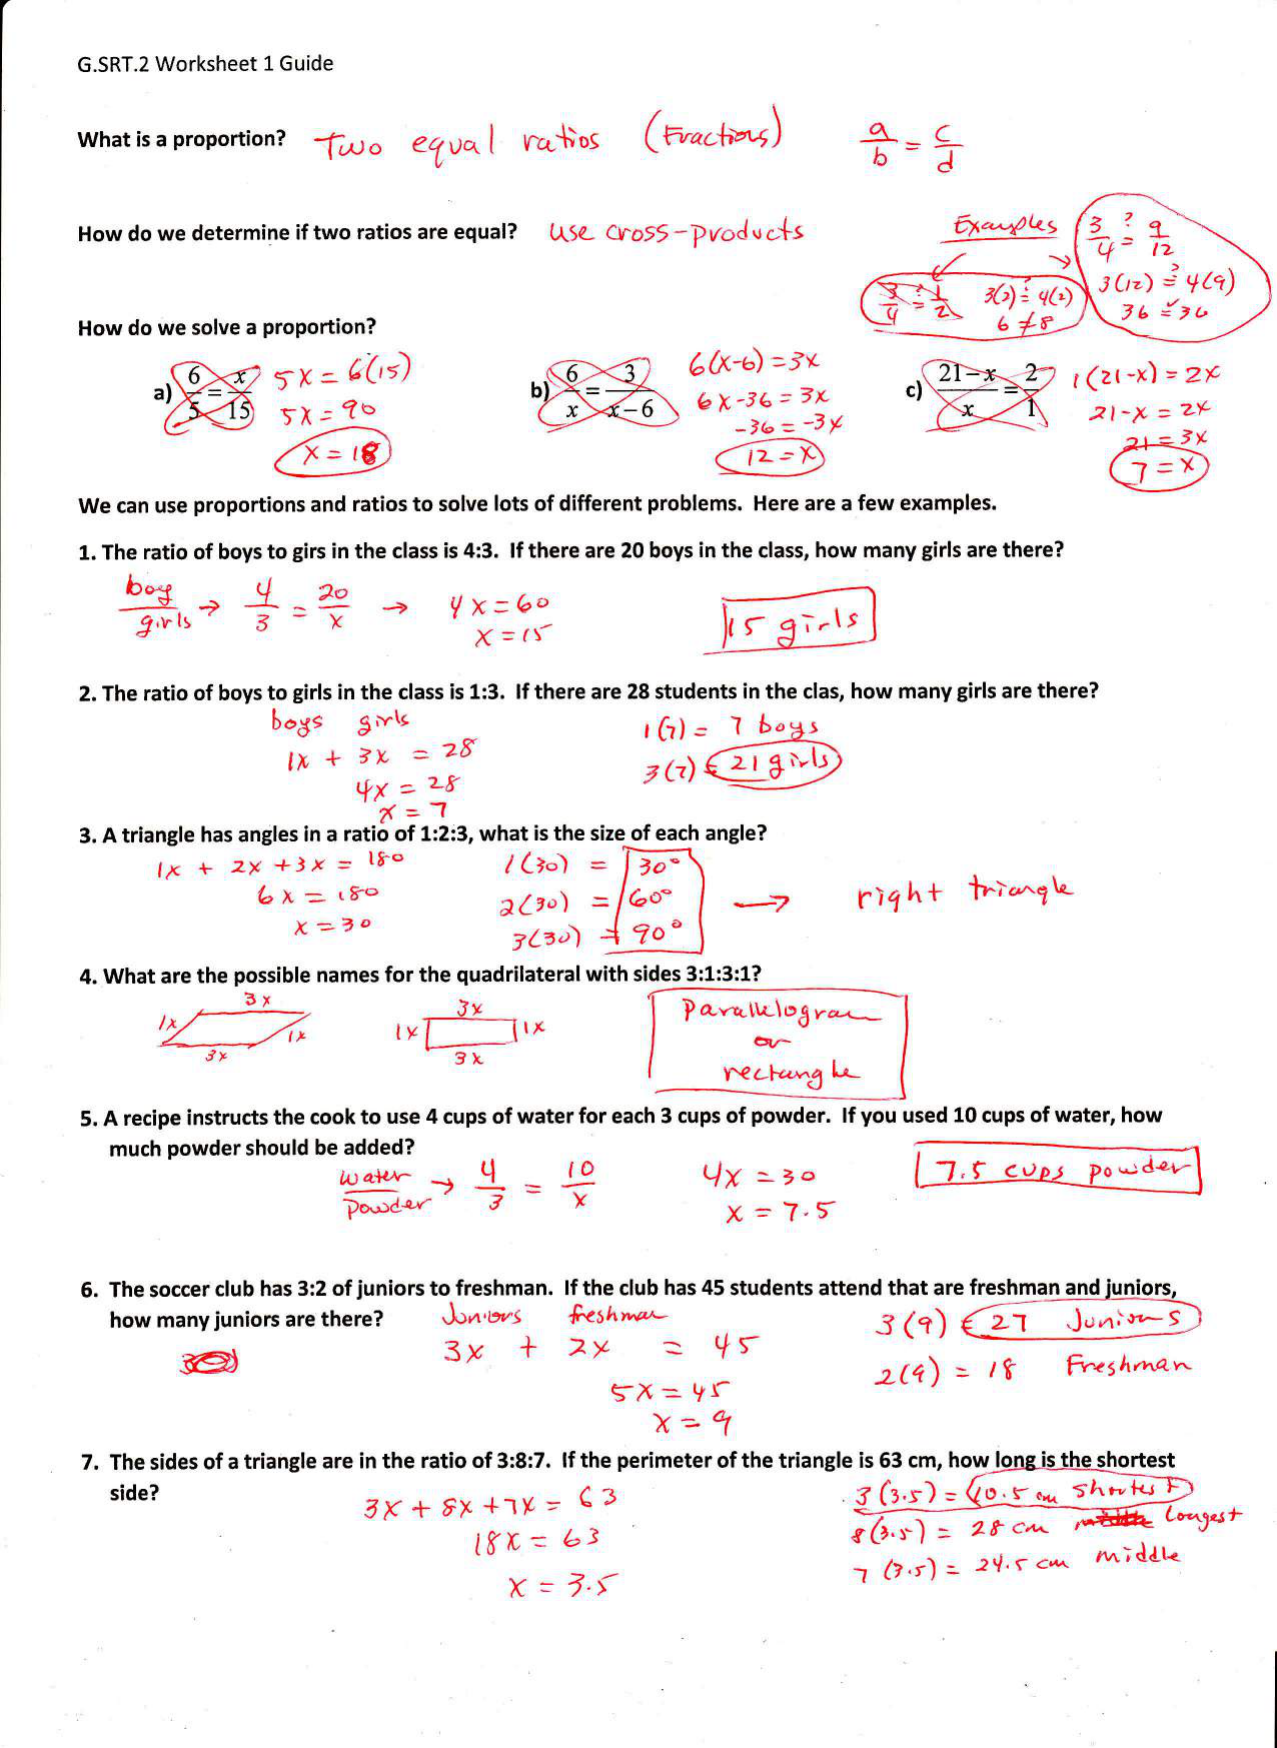 G.SRT.2 Worksheet 1 - TeacherWeb